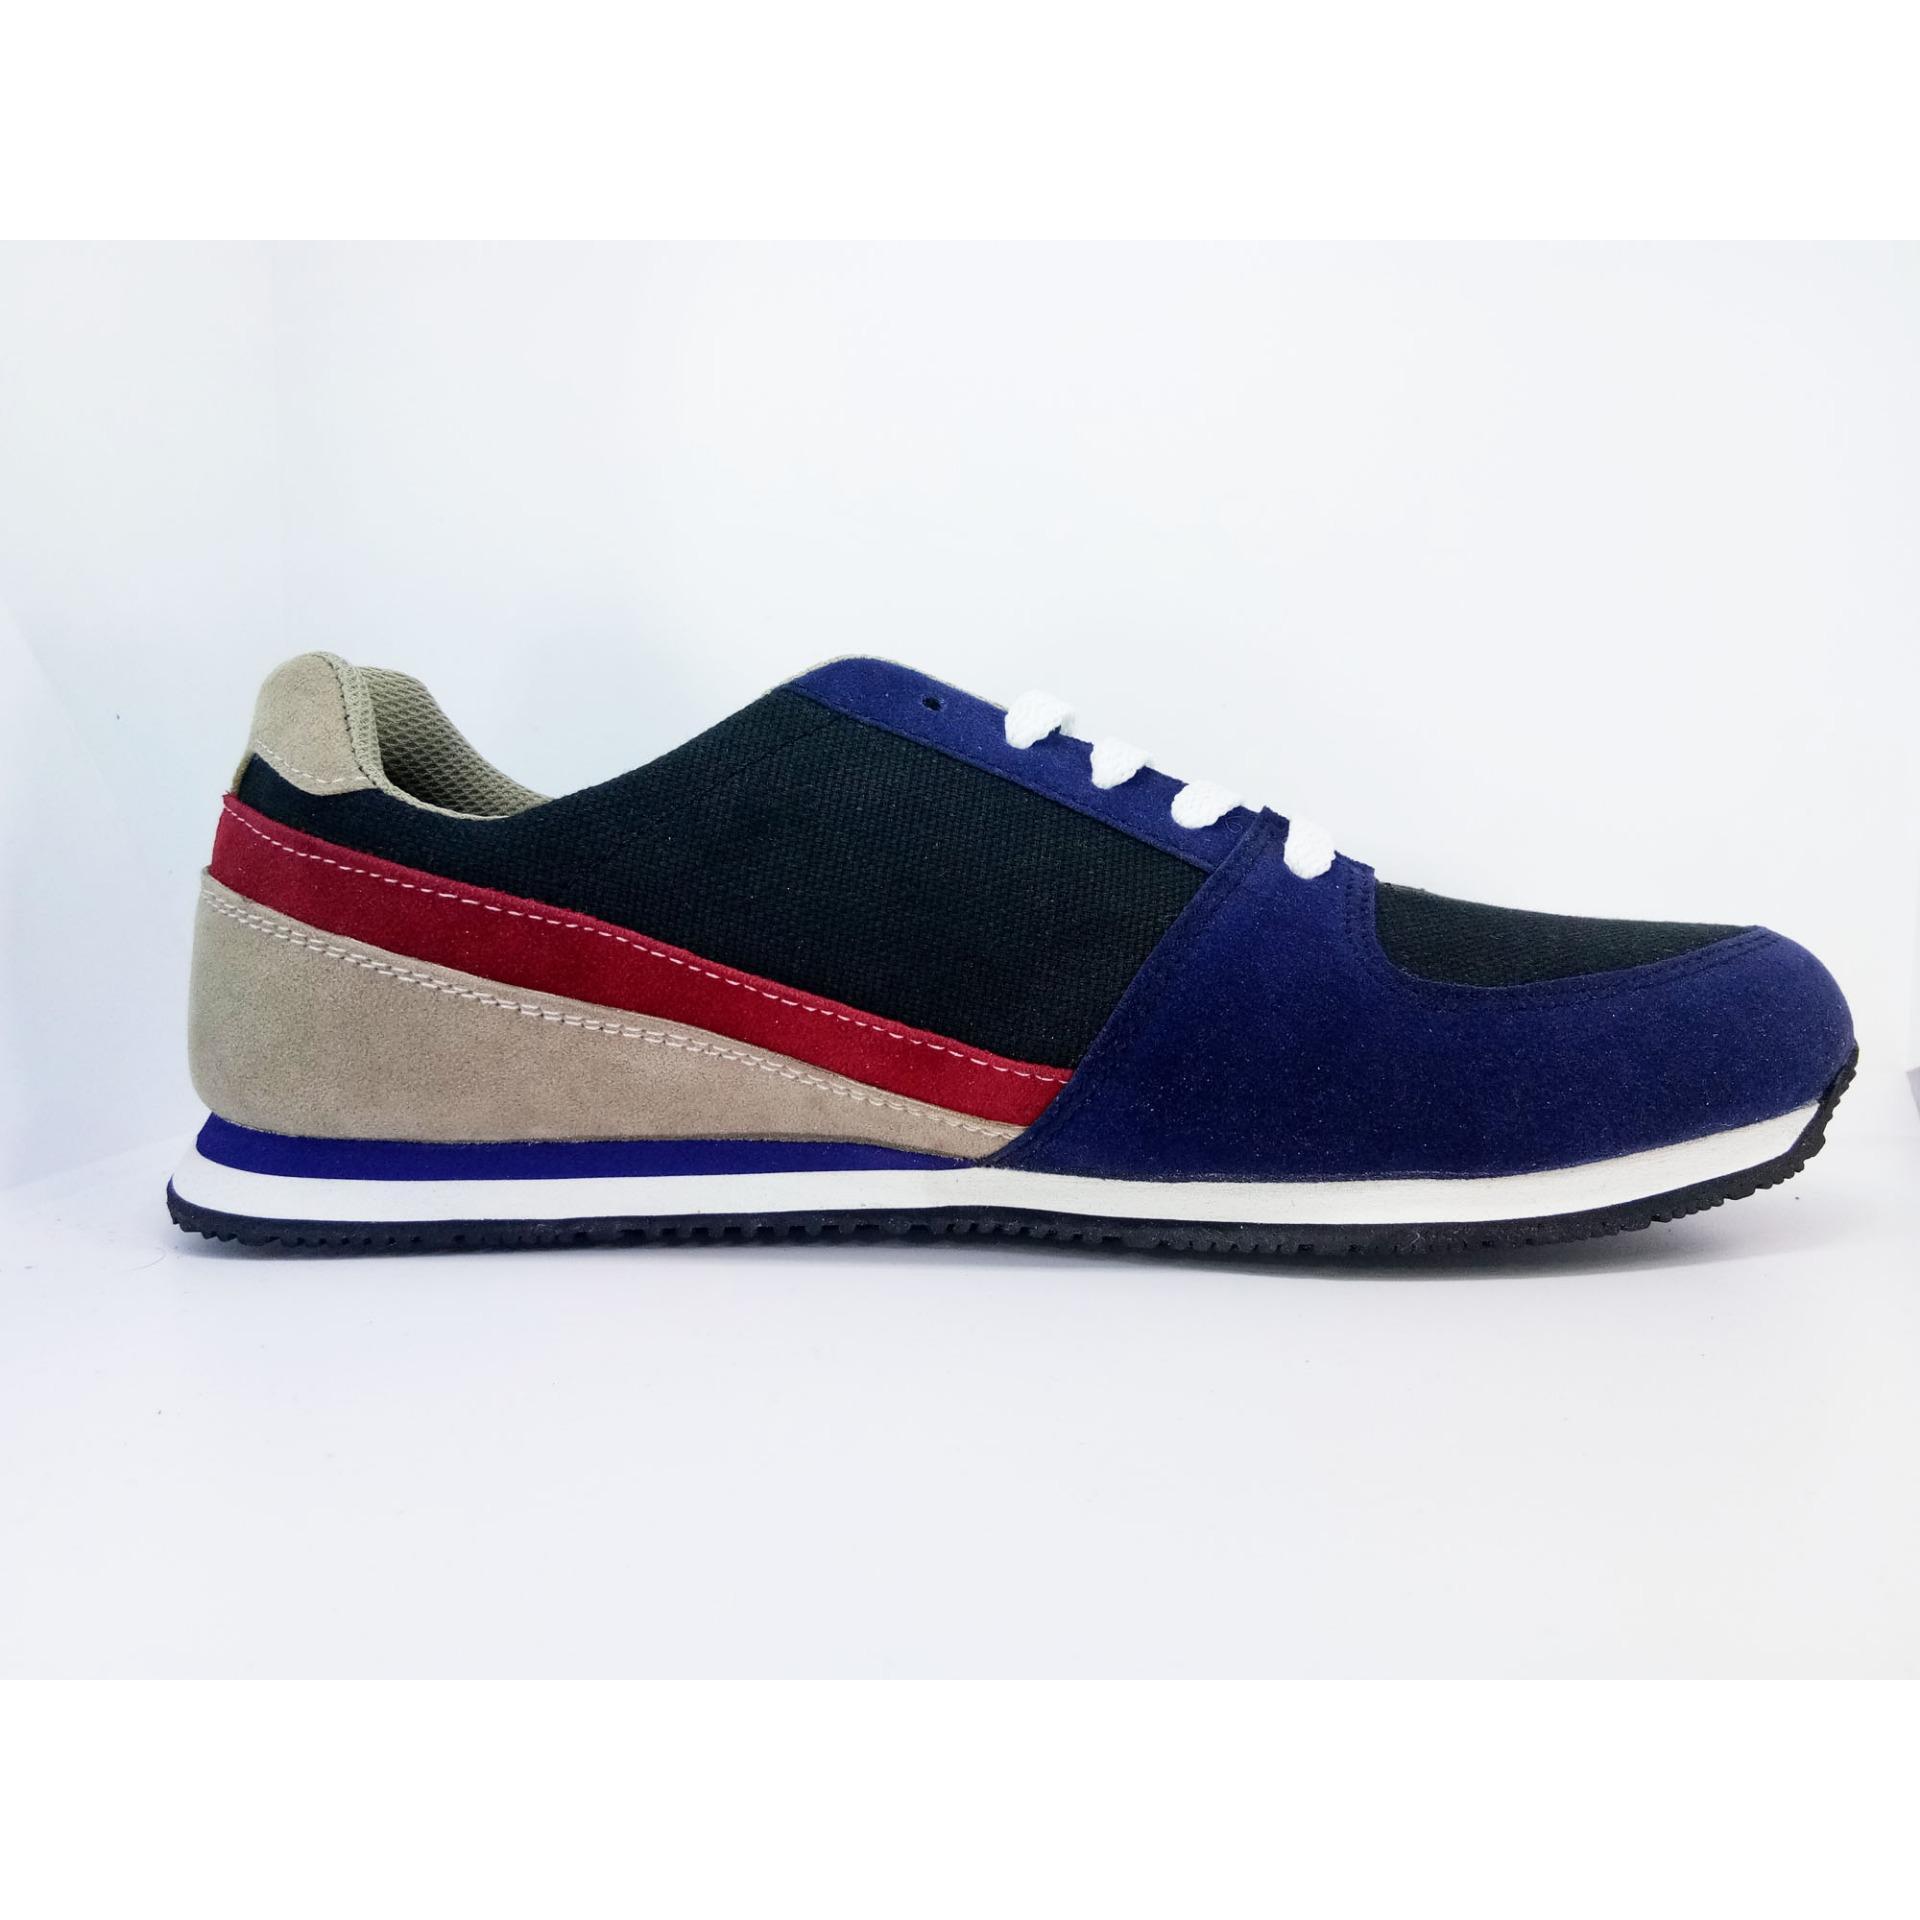 Review Gshop Sny 6076 Sepatu Sneaker Pria Suede Eva Bagus Navy Kom Jawa Barat